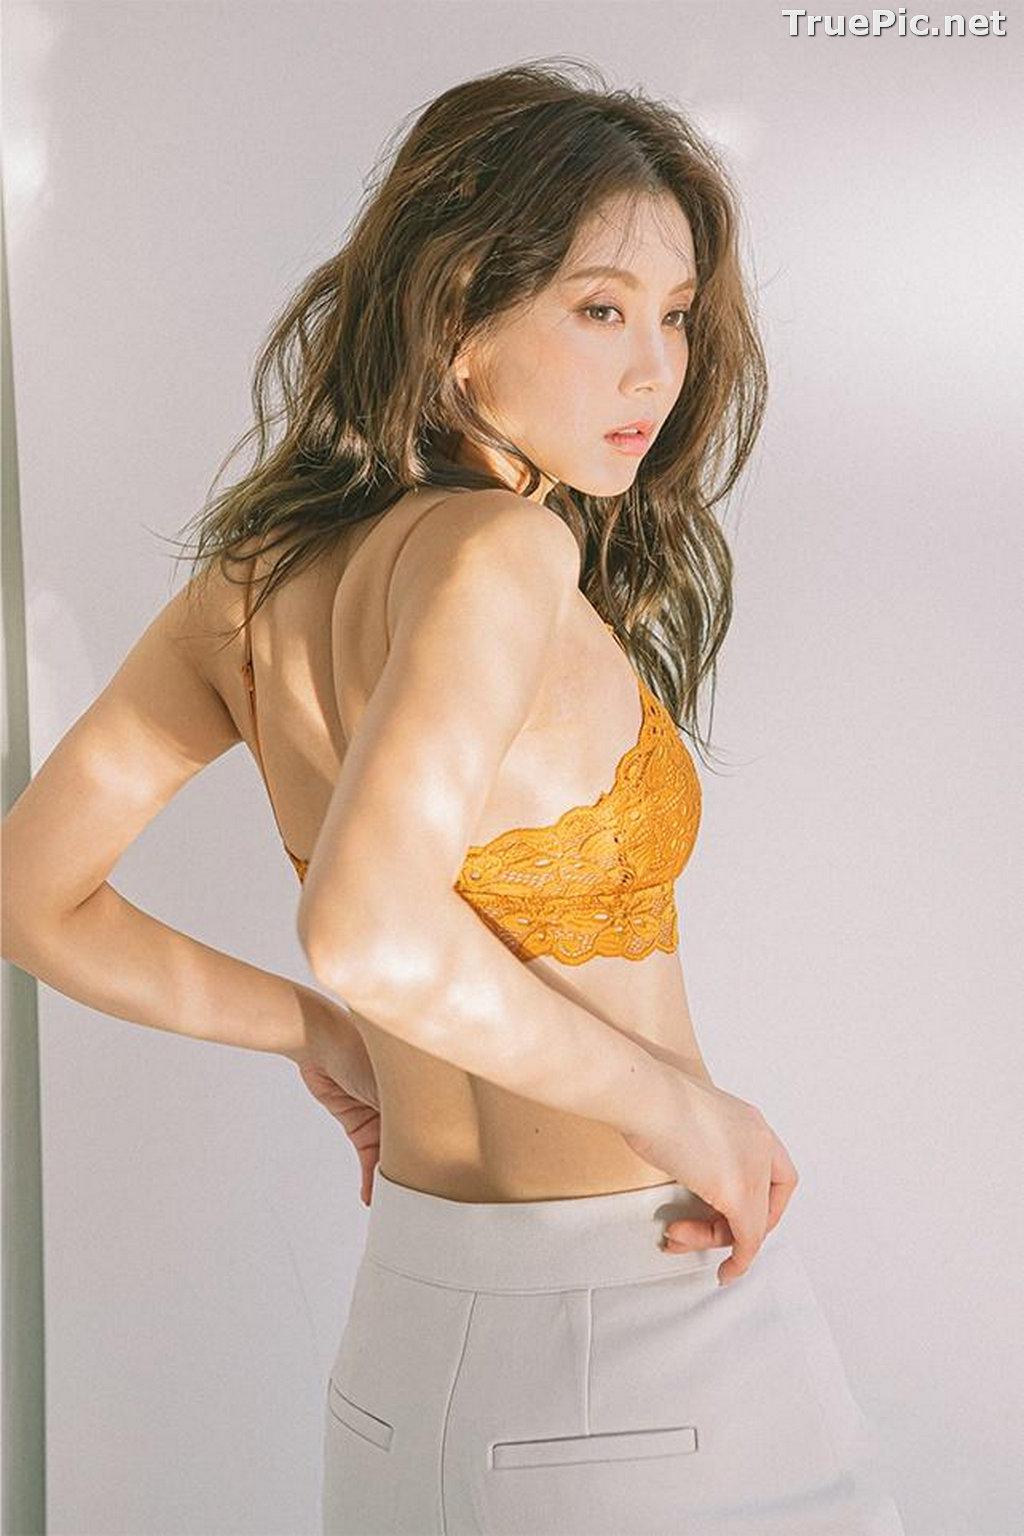 Image Korean Fashion Model – Lee Chae Eun (이채은) – Come On Vincent Lingerie #10 - TruePic.net - Picture-10